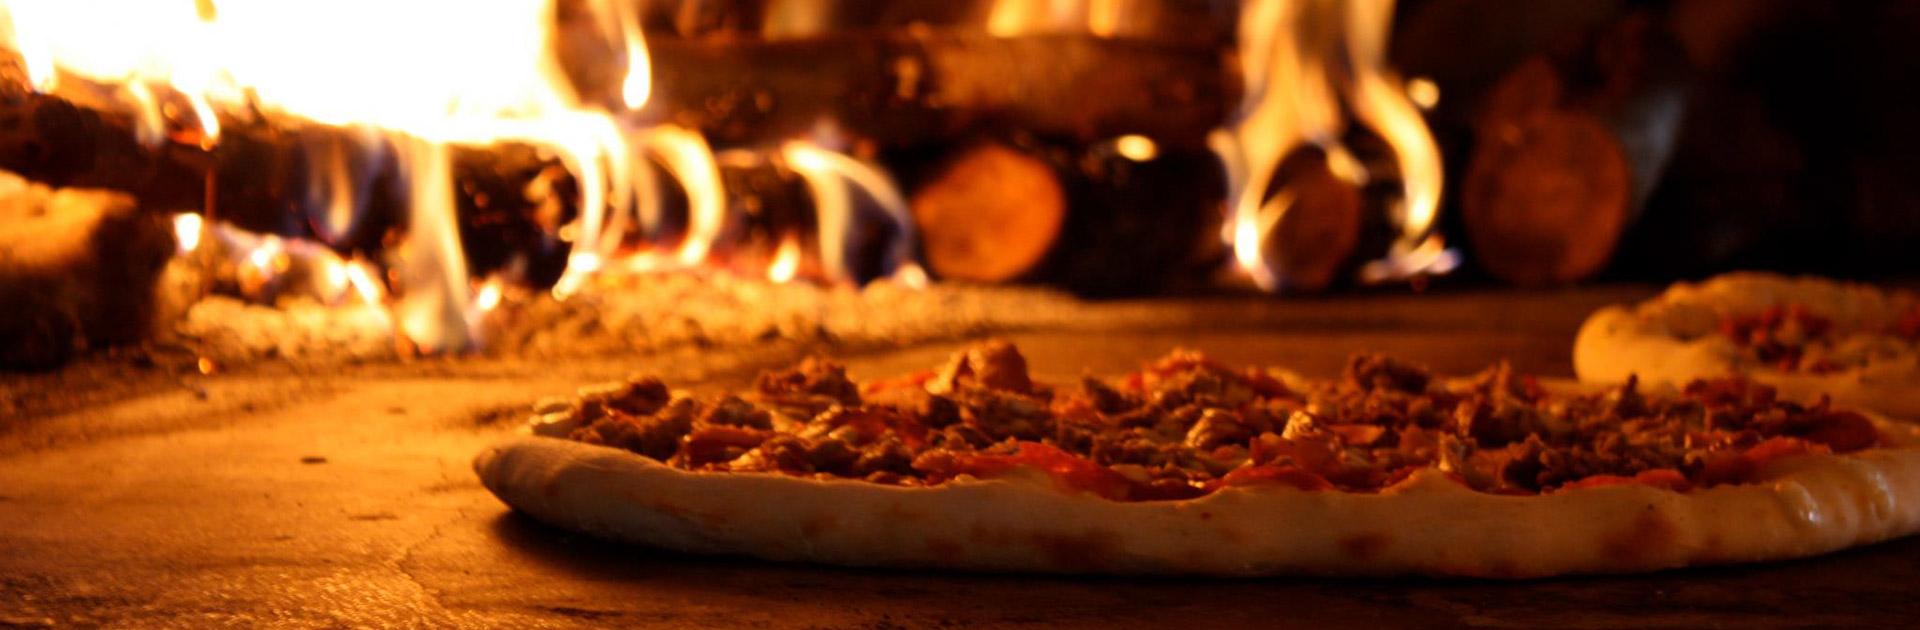 Pizze cotte in forno a legna